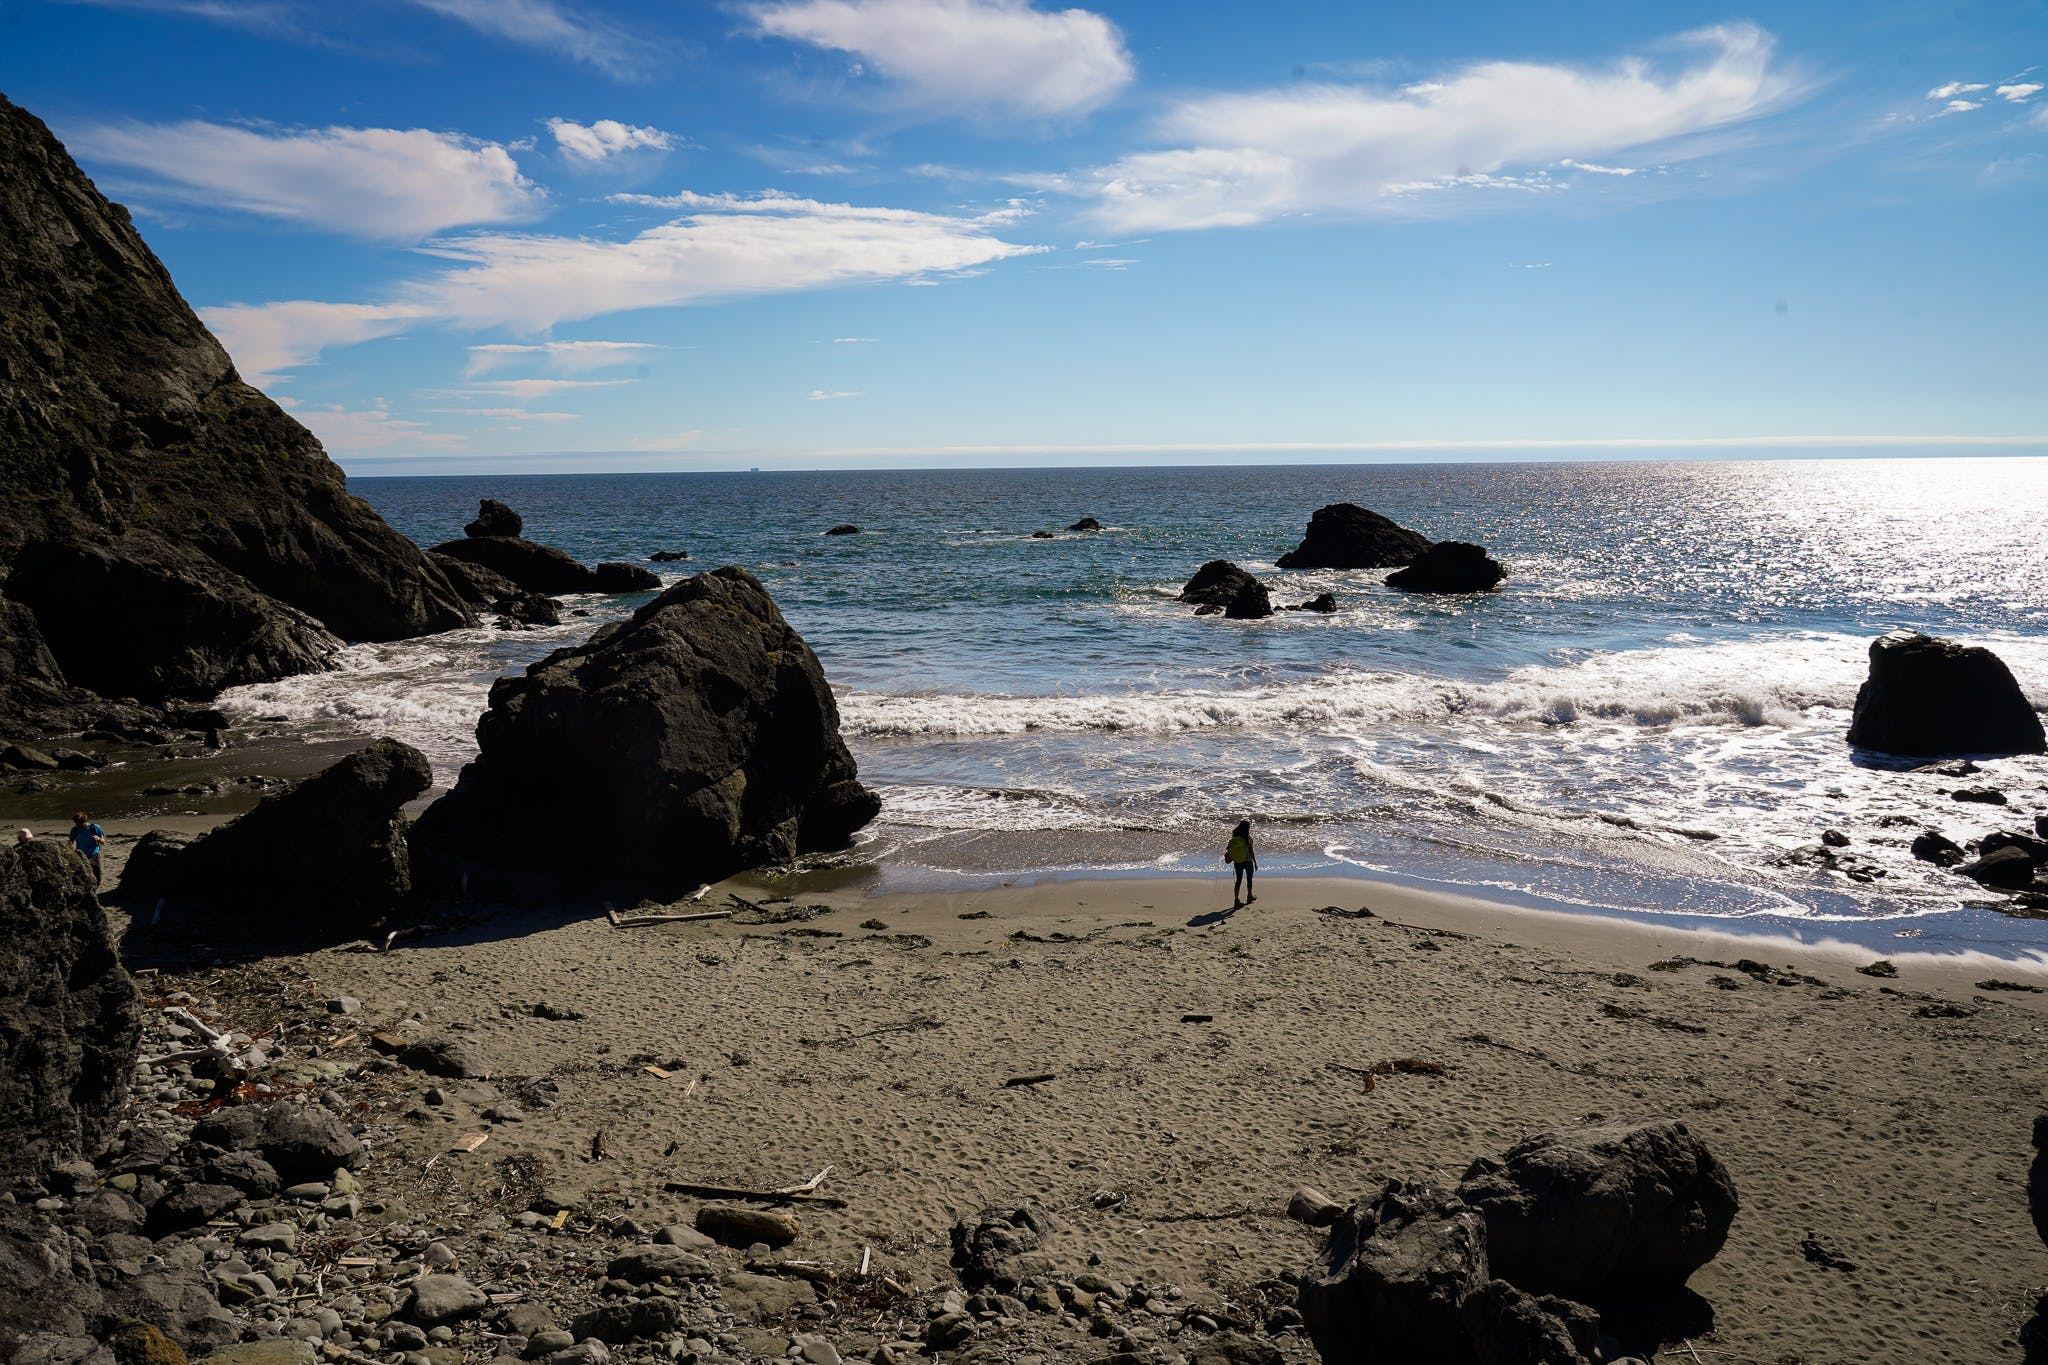 Pirates Cove Beach in the Marin Headlands